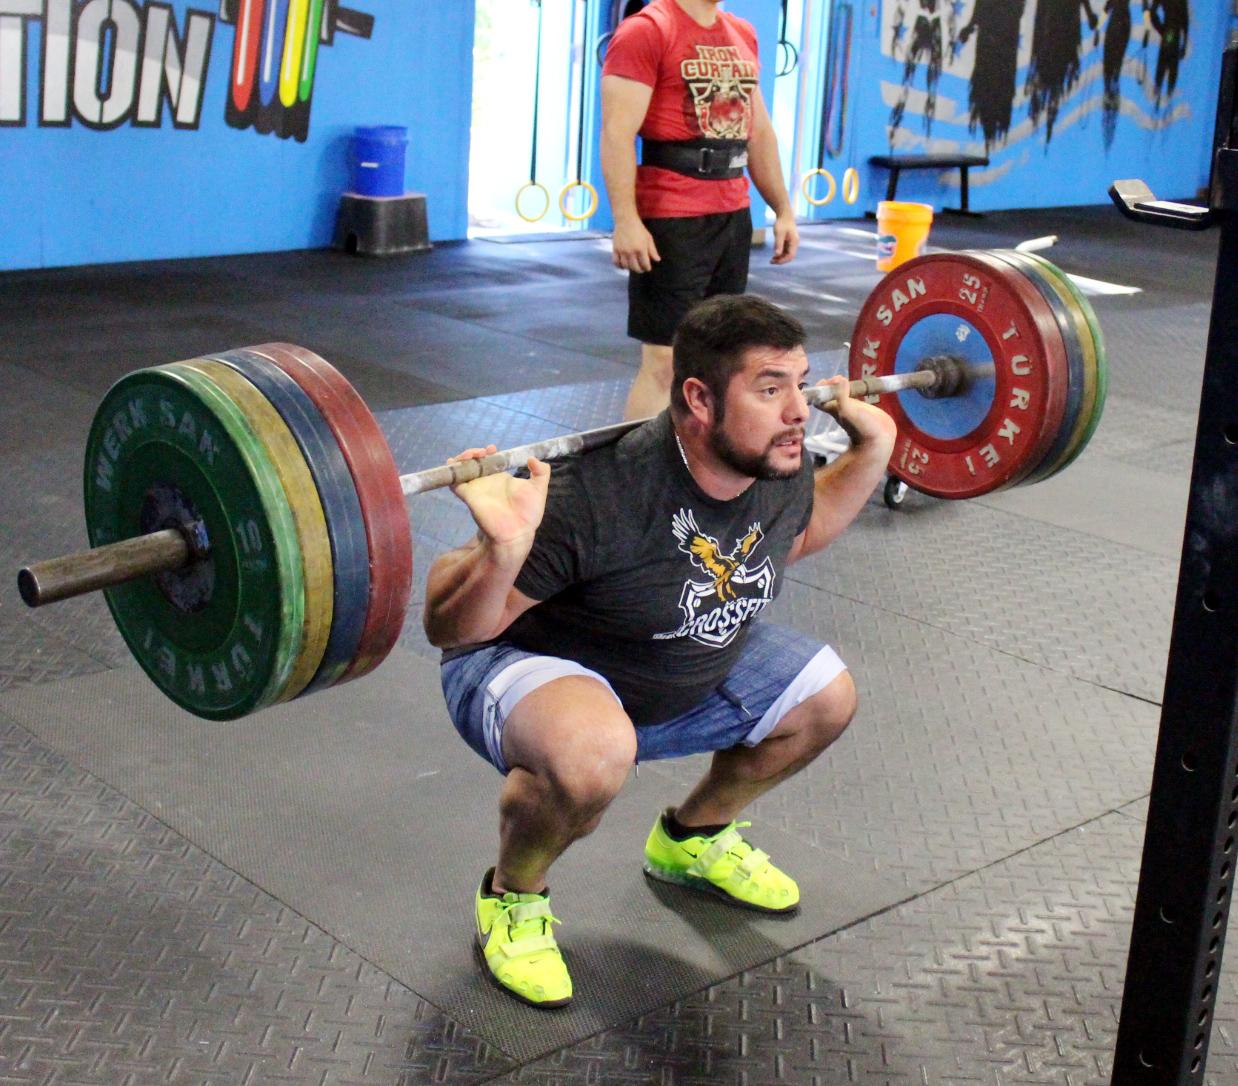 Nestor casually back squatting